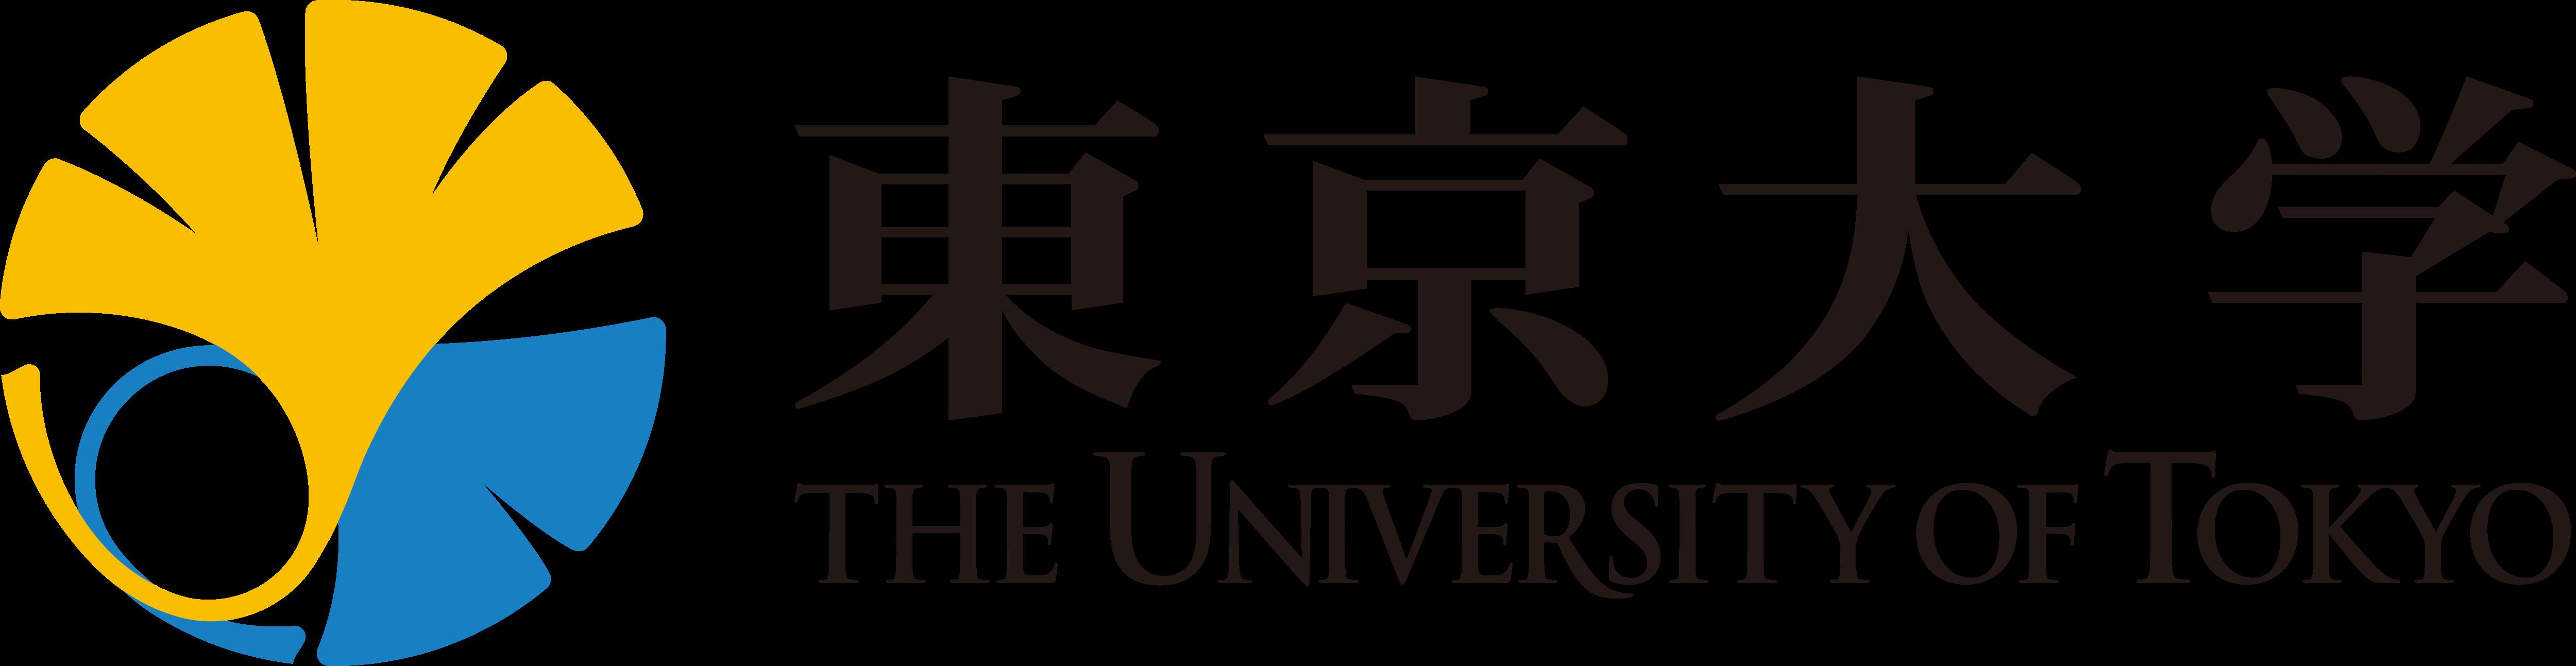 Image result for university of tokyo logo